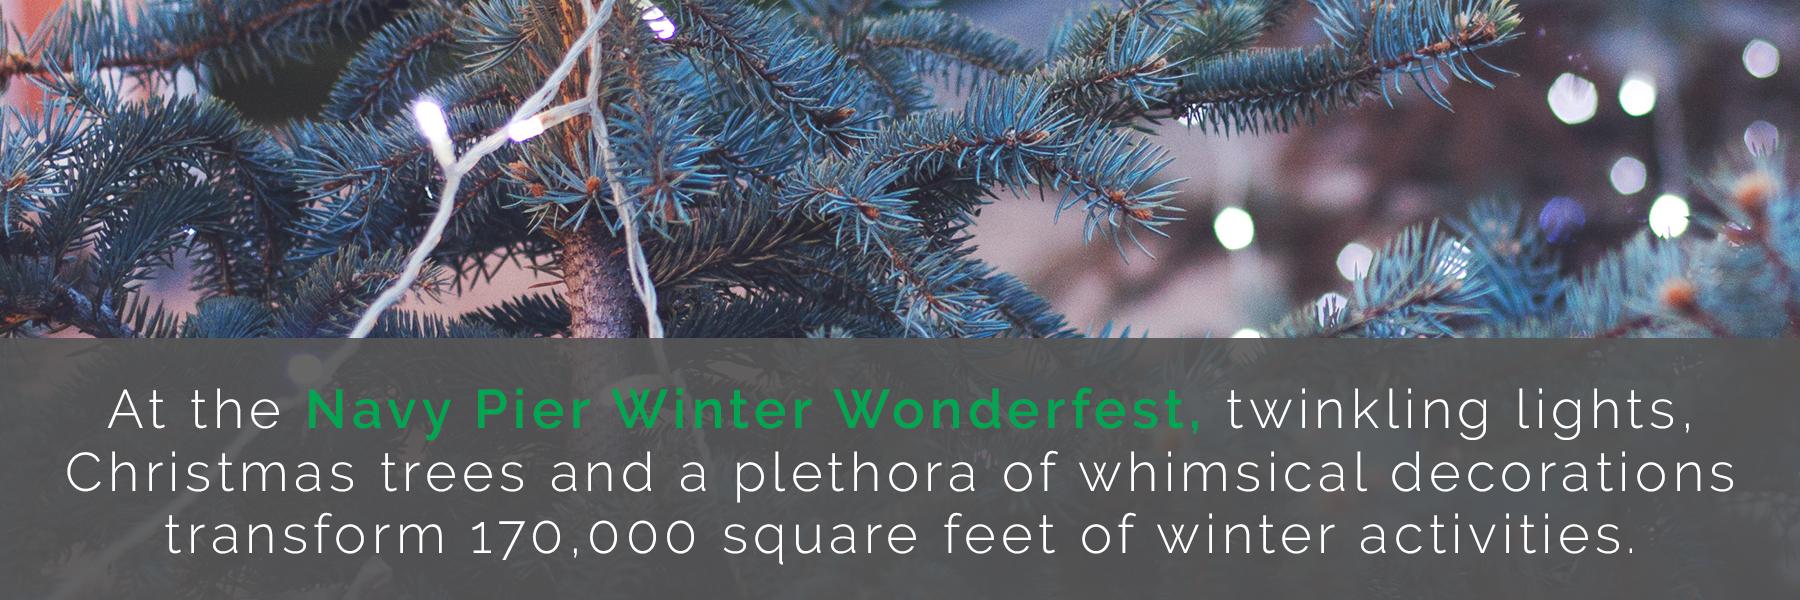 170,000 square feet of winter activities